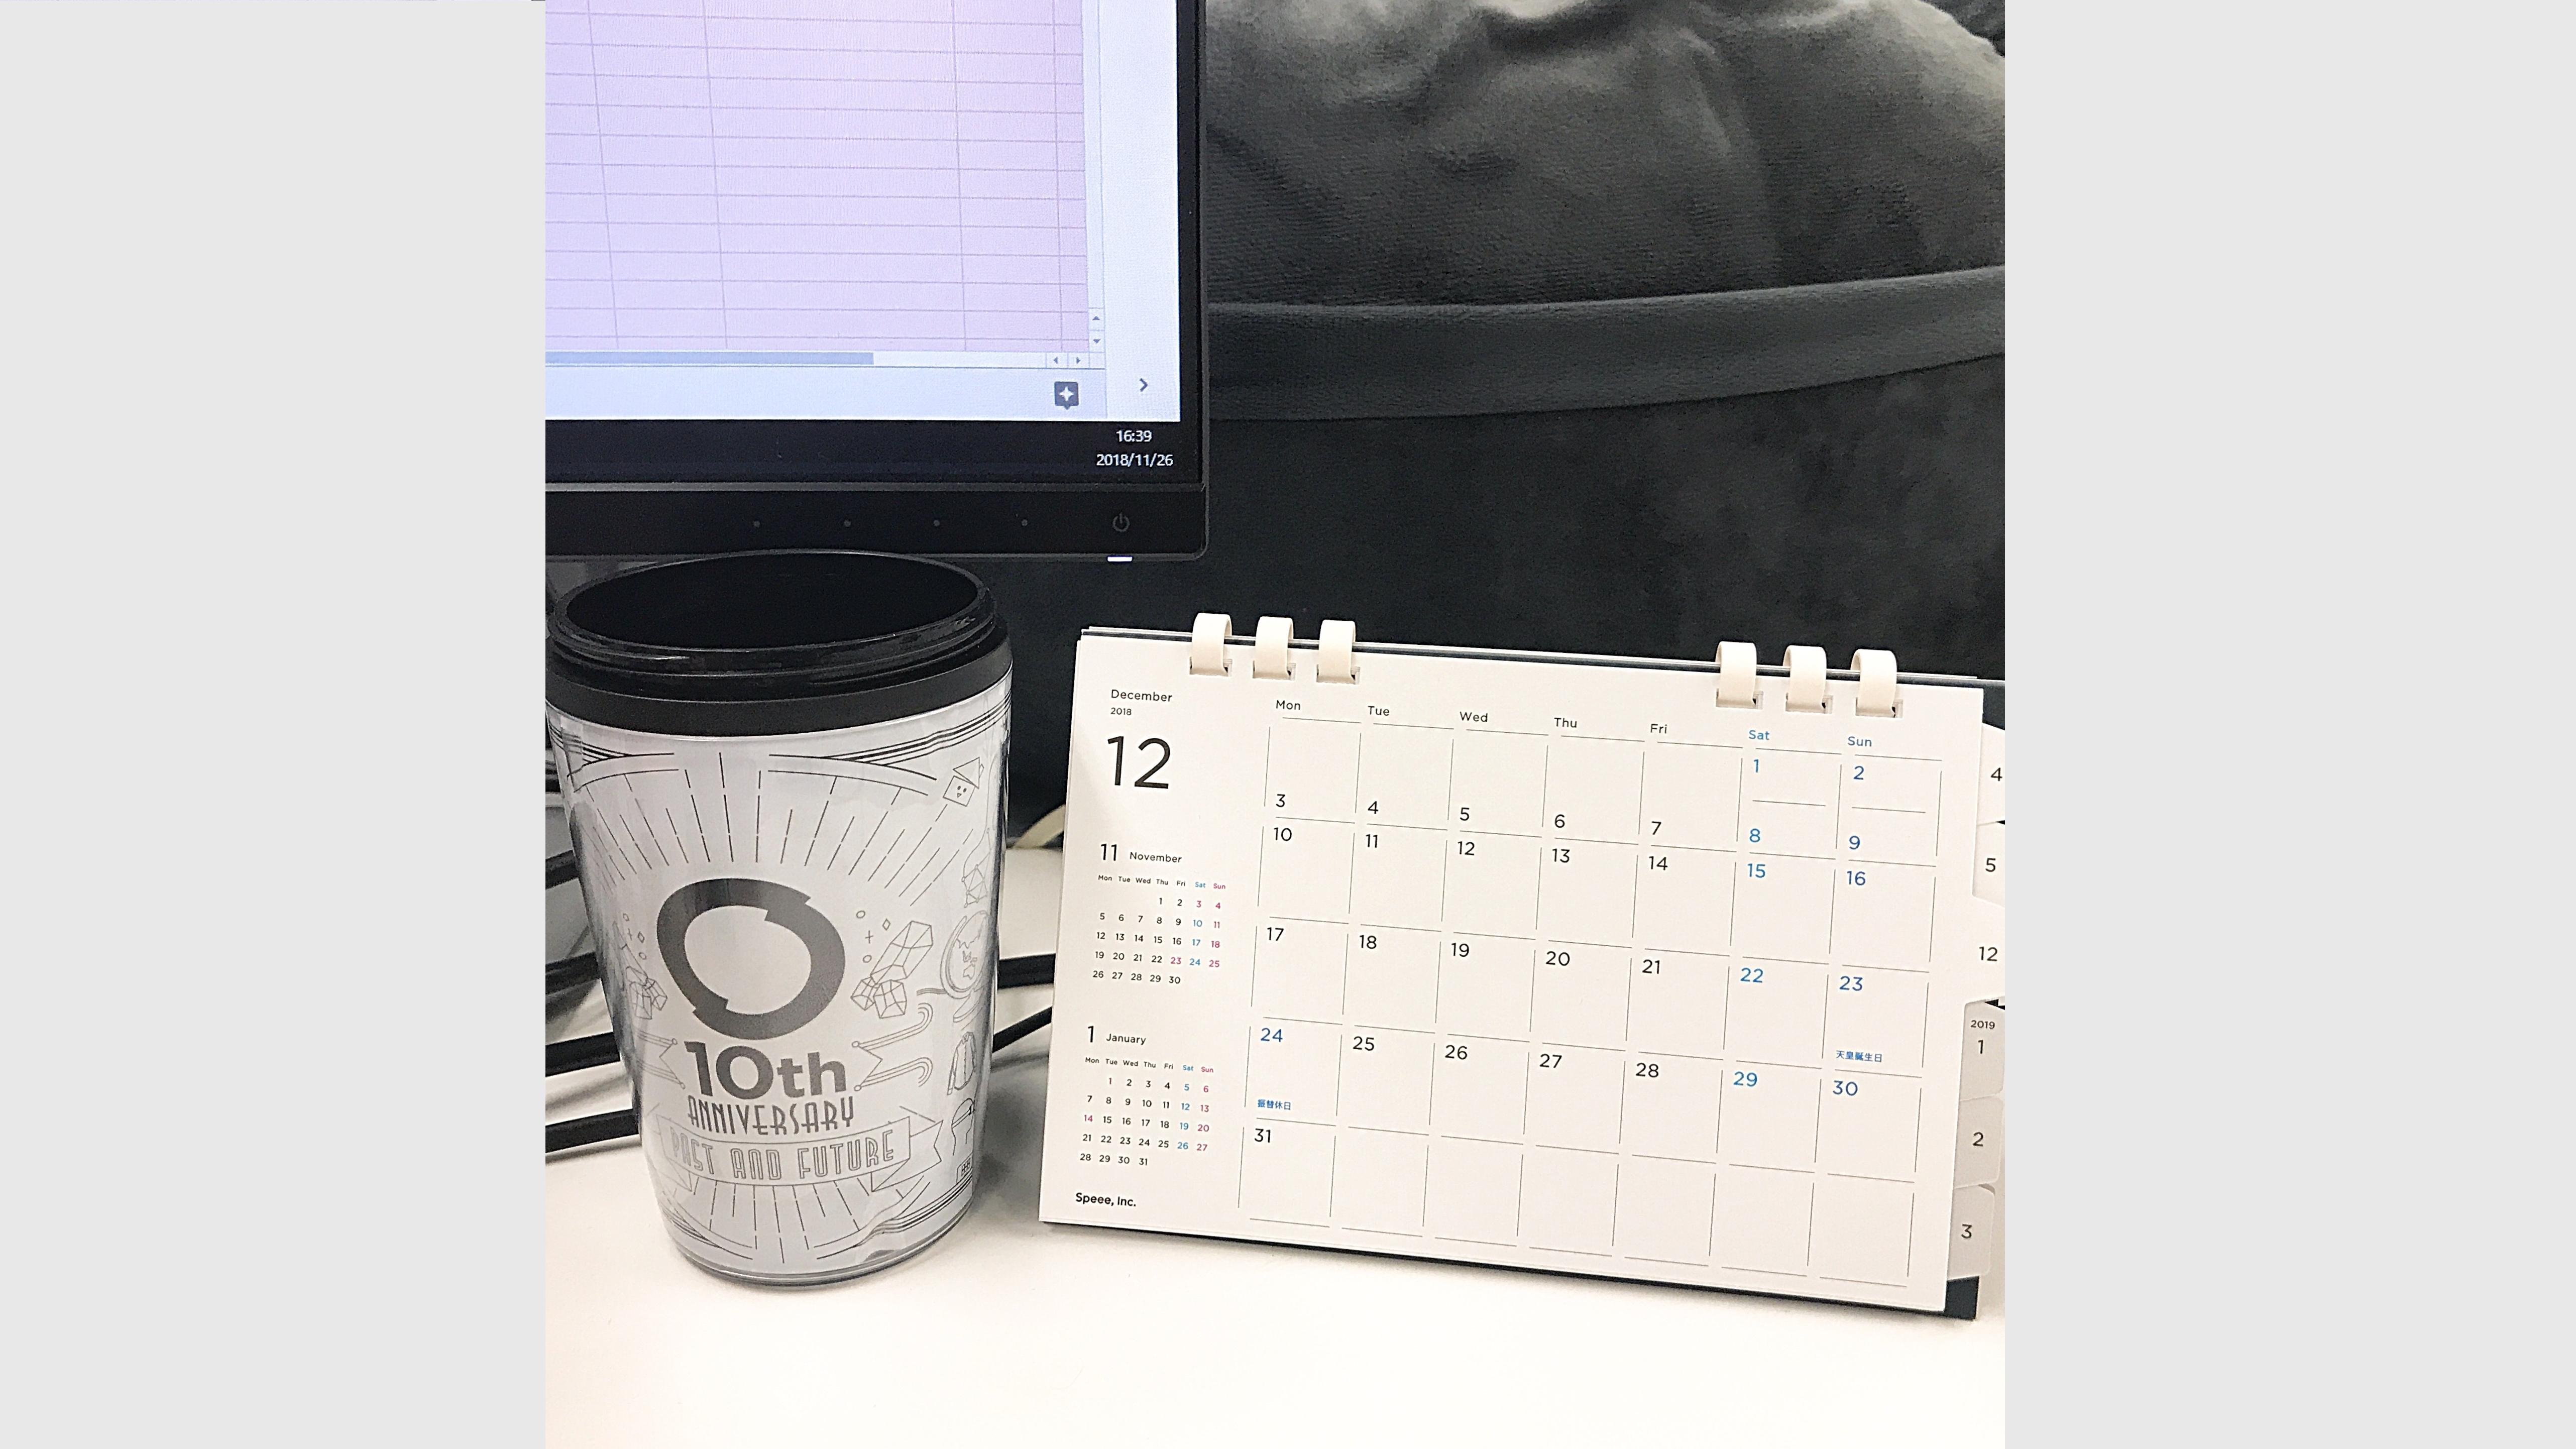 Speeeオリジナルカレンダー